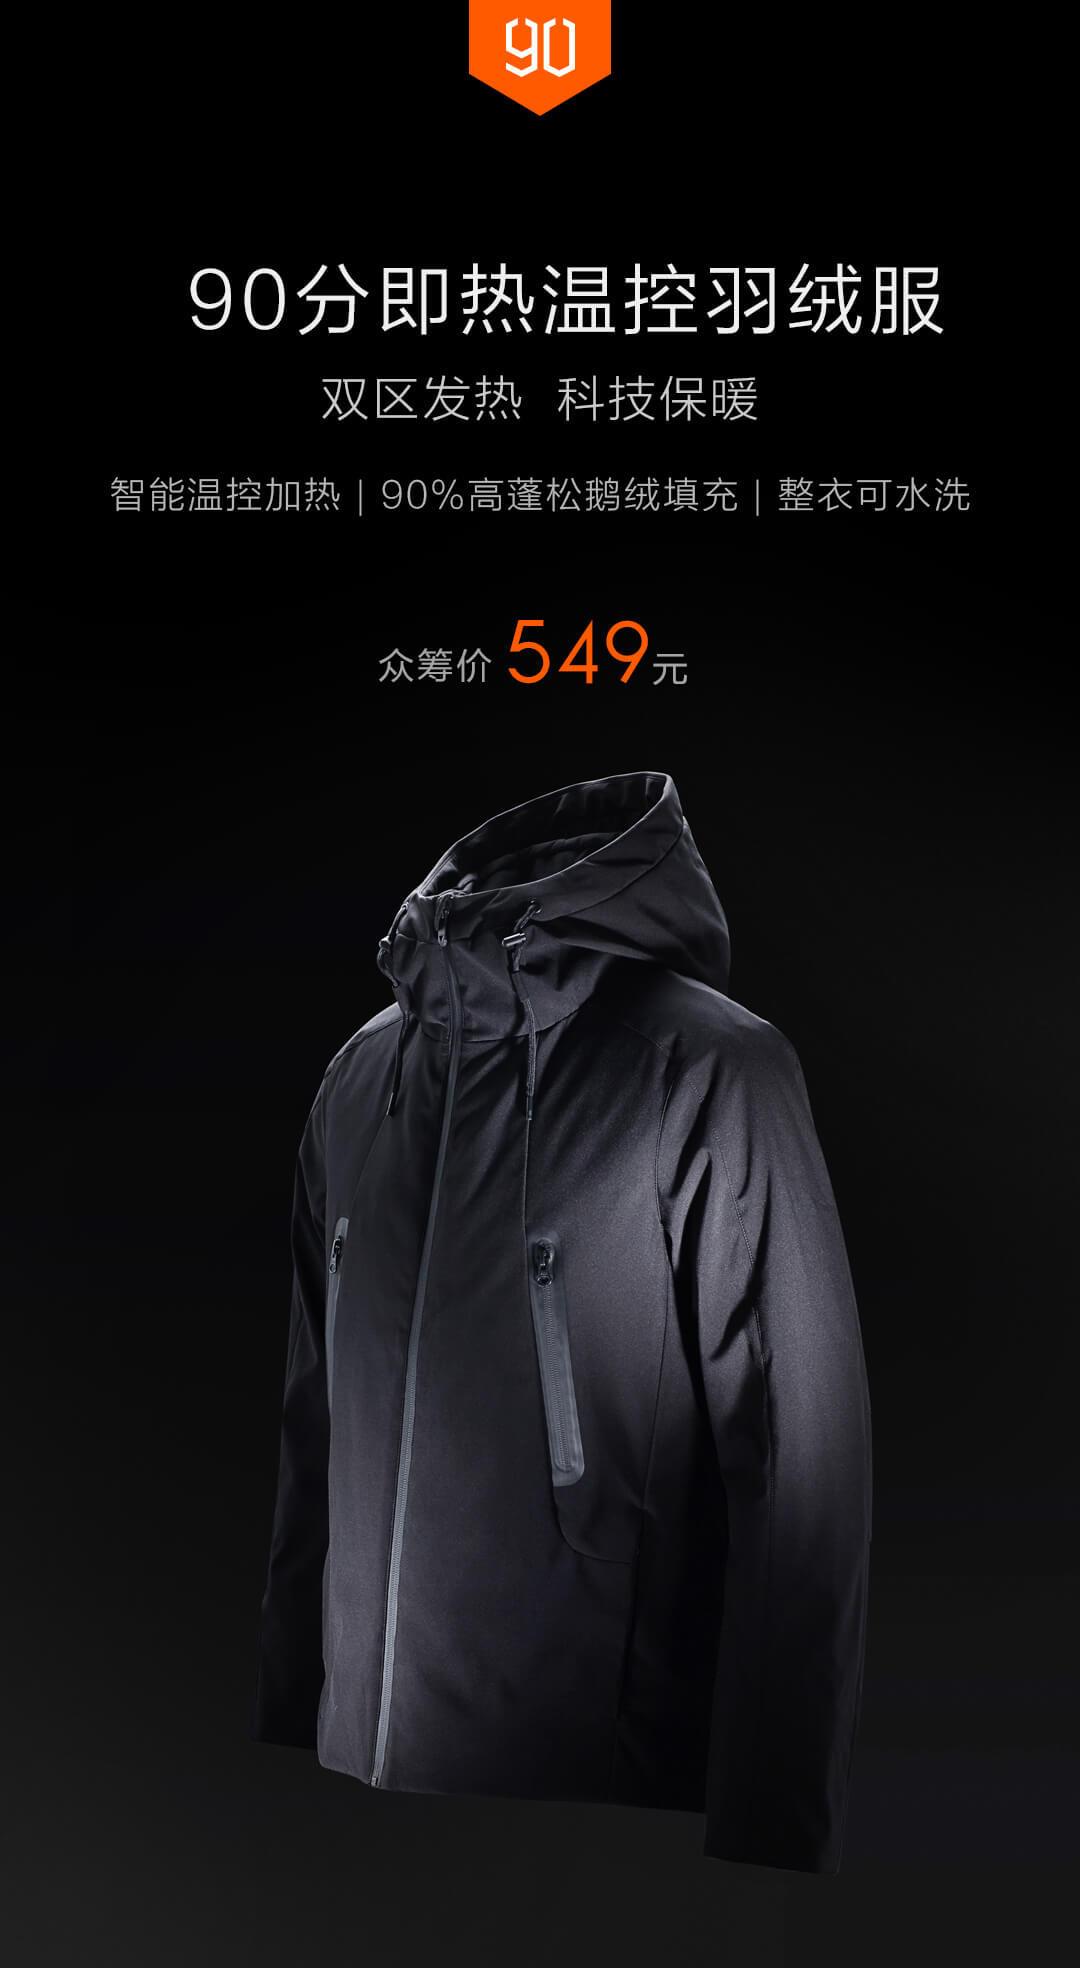 Kurtka Xiaomi - 90 Minutes